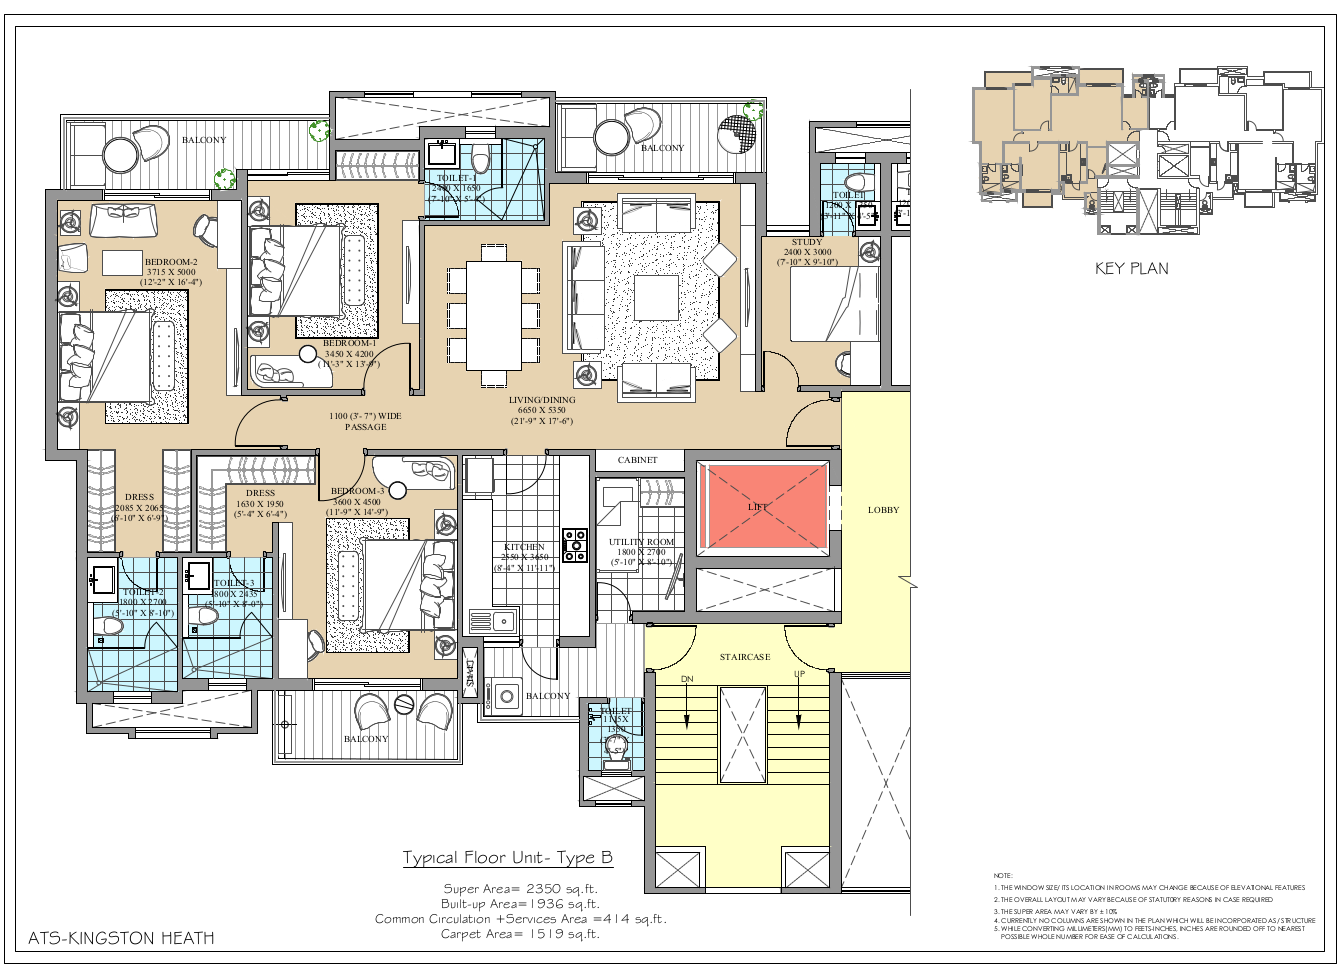 3 BHK floor plan ats kingston